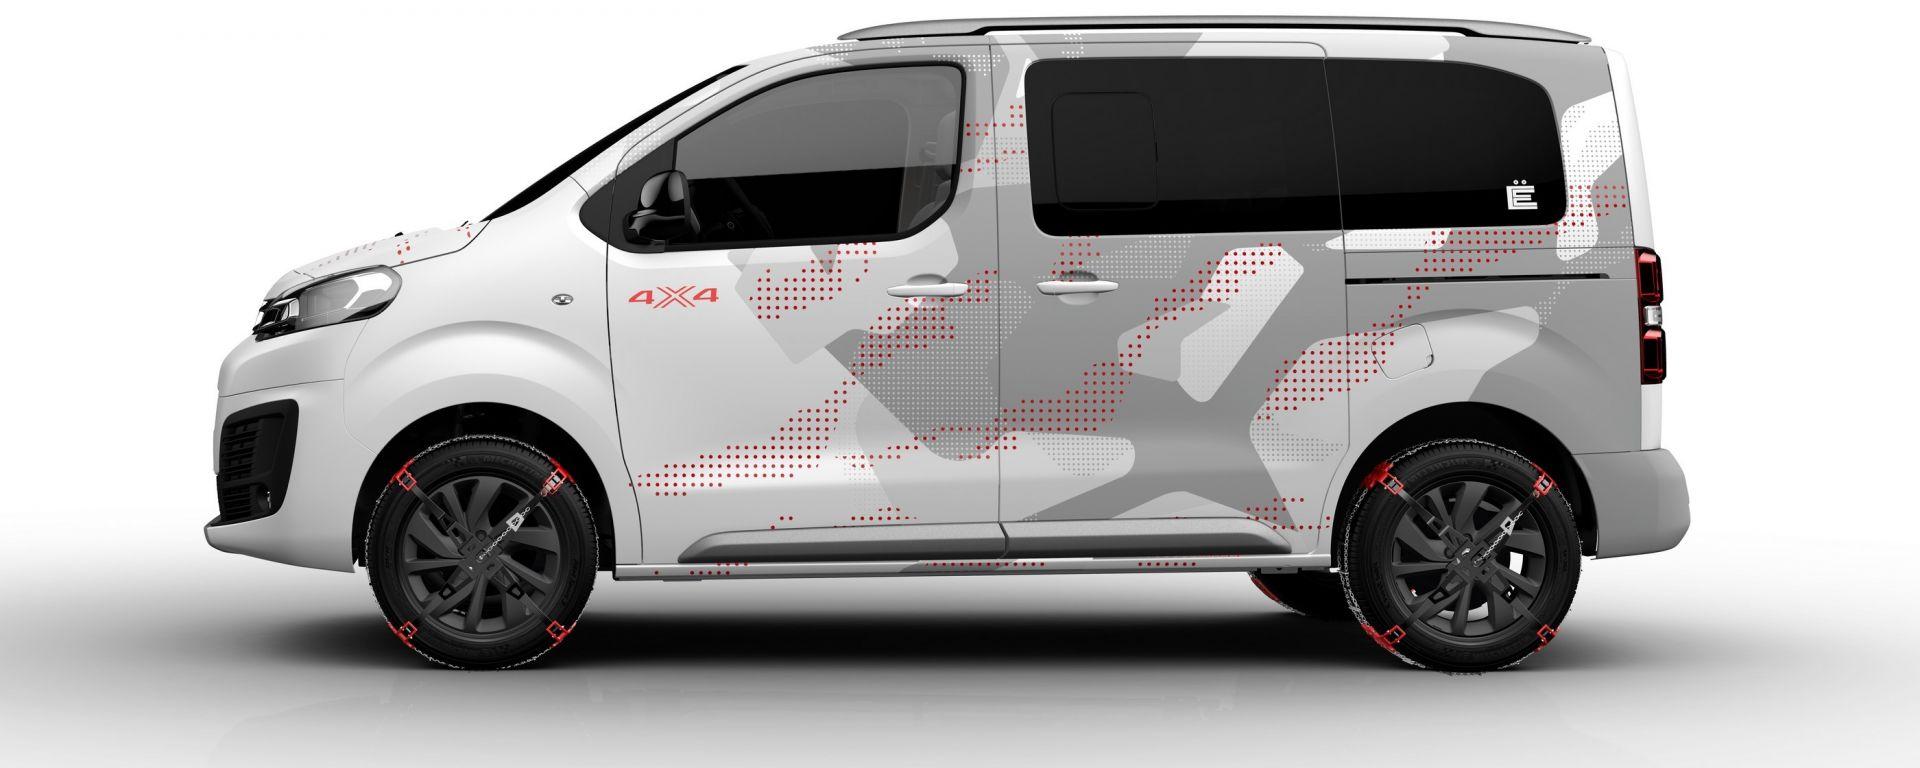 salone di ginevra 2017 citroen spacetourer 4x4 concept il van per l avventura motorbox. Black Bedroom Furniture Sets. Home Design Ideas